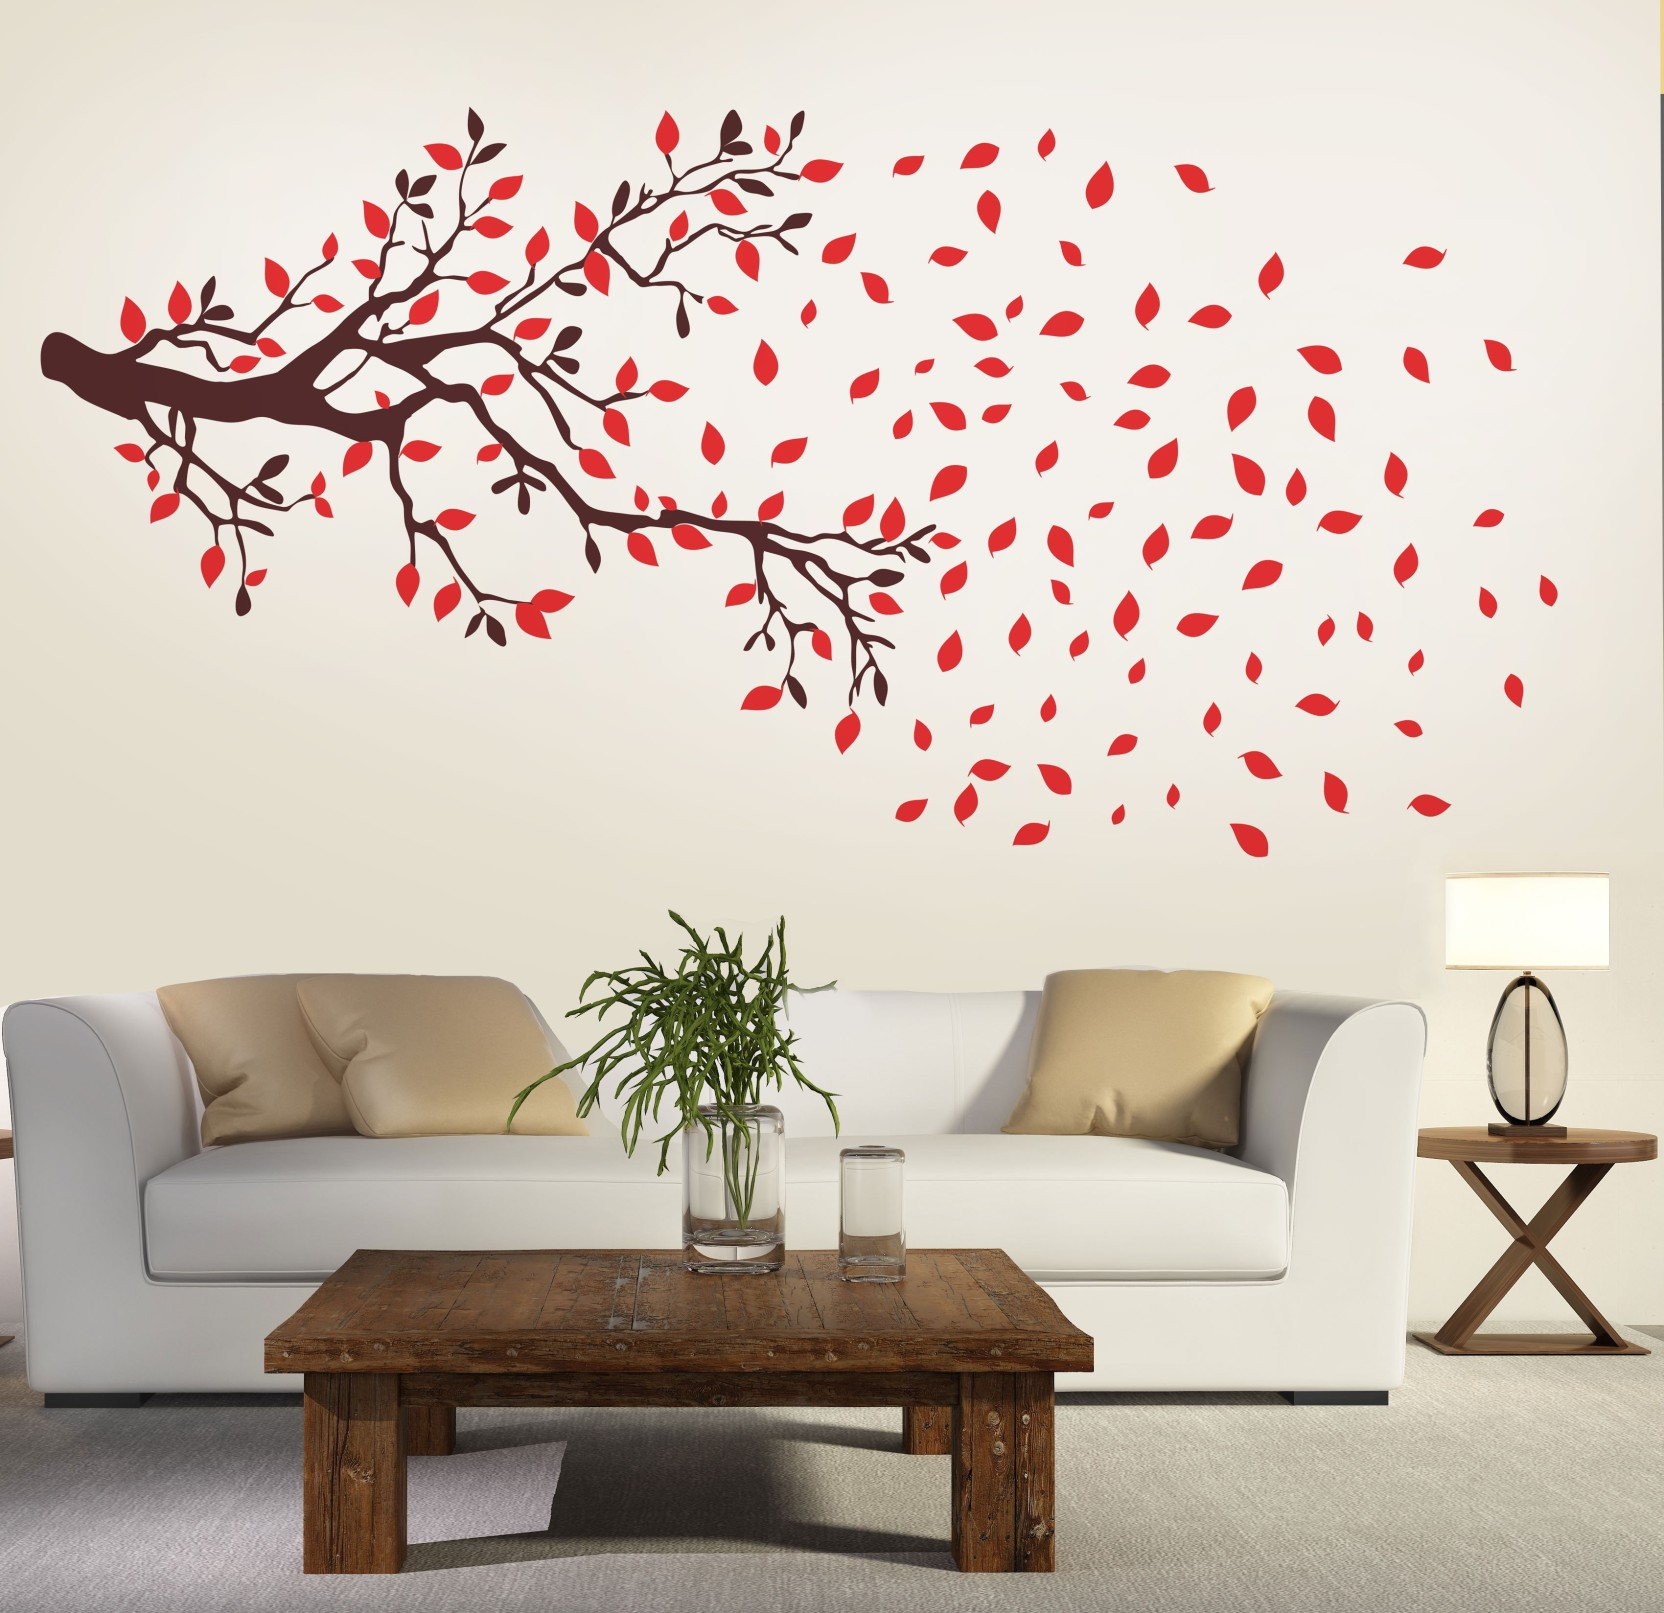 New Way Decals Wall Sticker Floral & Botanical Wallpaper ...